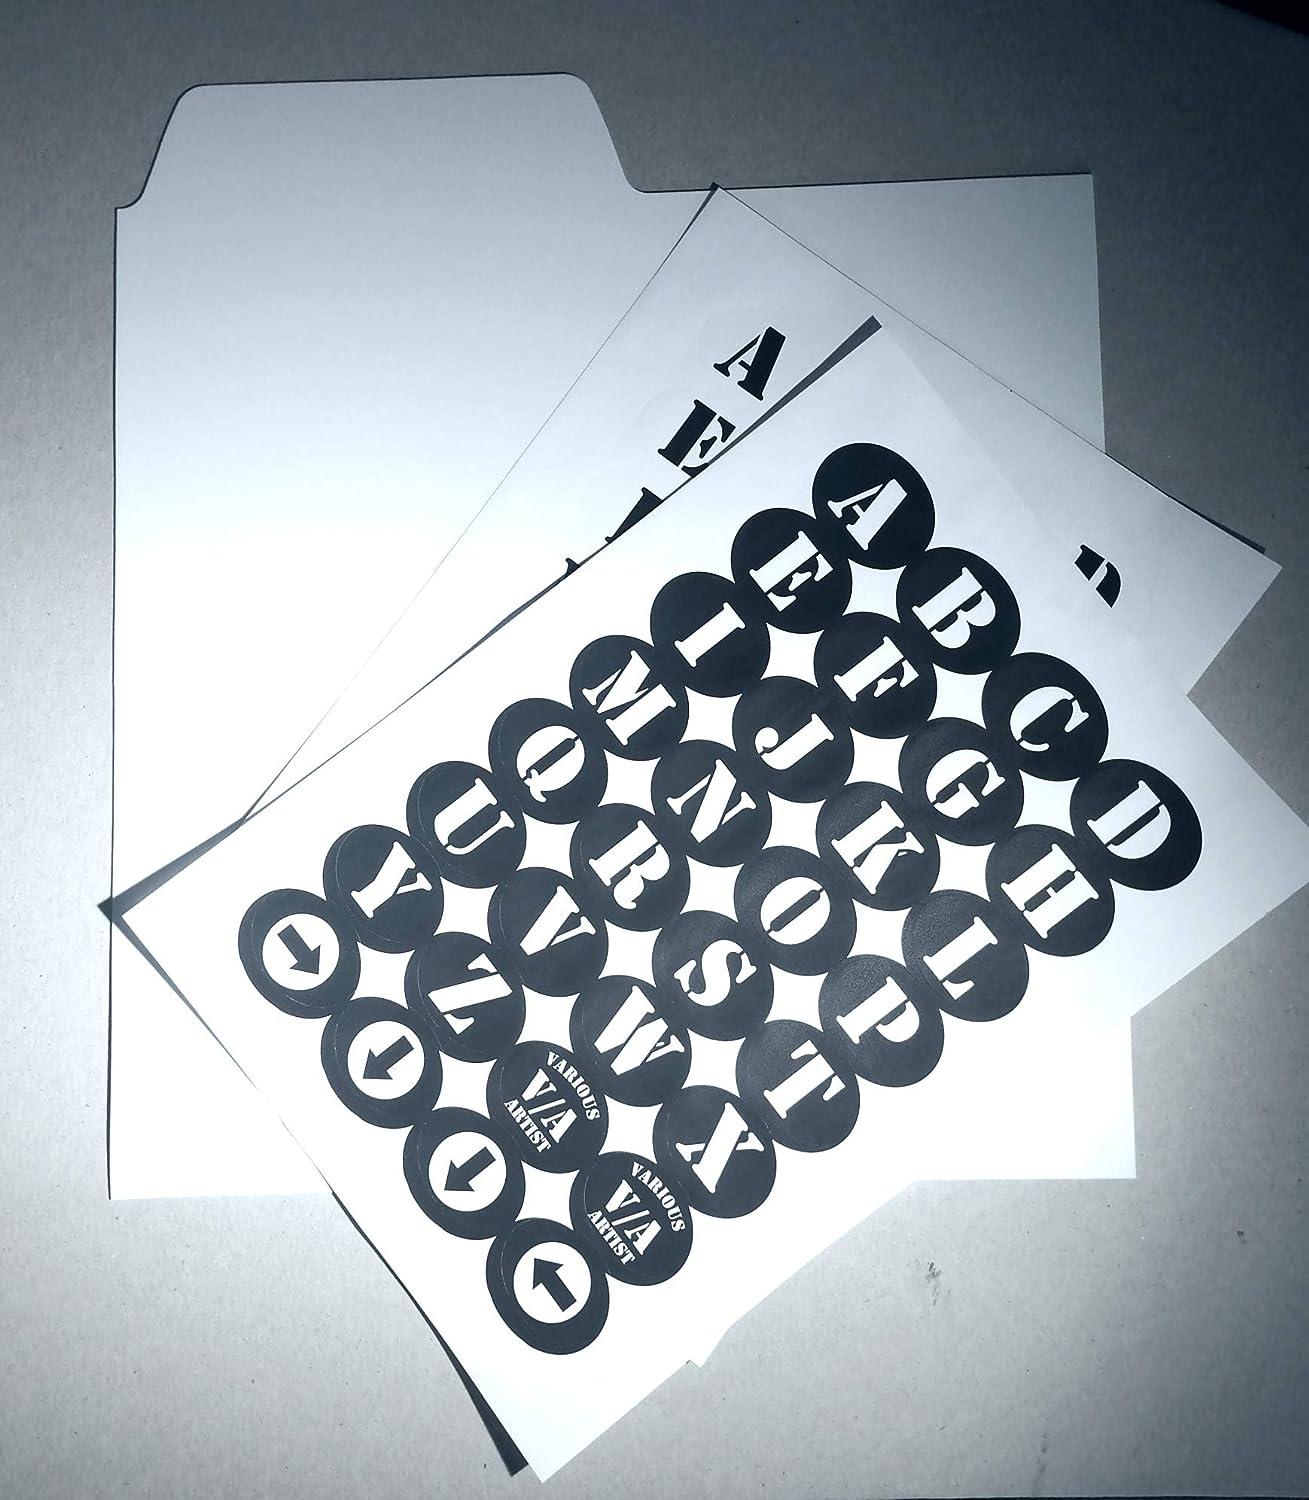 werkzeyt zyd380150/Tige Lampe de poche aluminium 1500/lumens